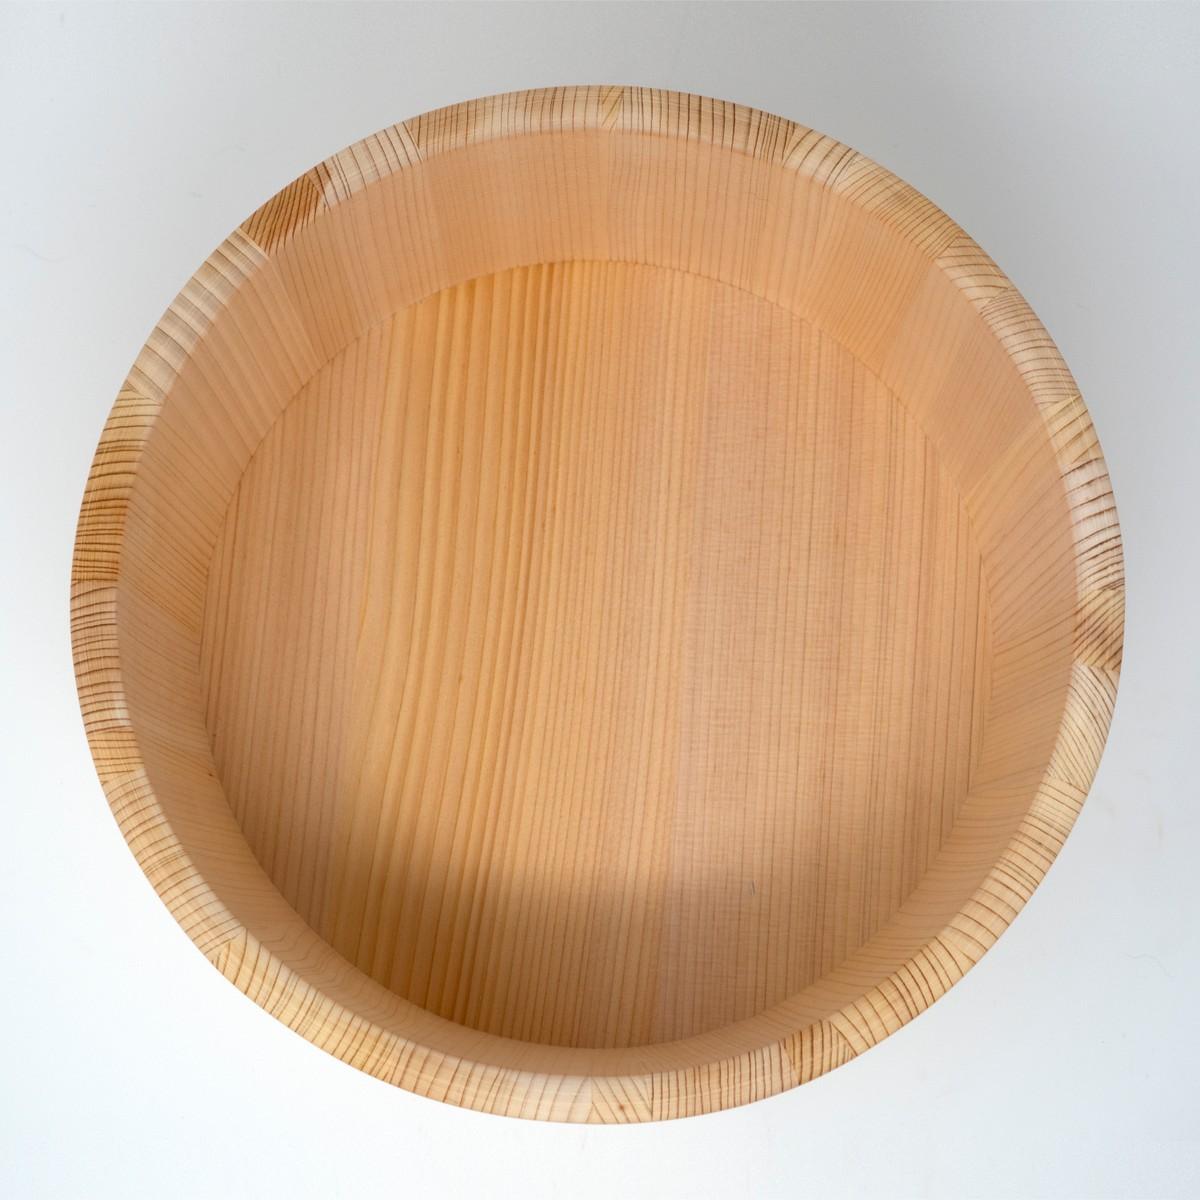 Photo of Oke Bath Bowl